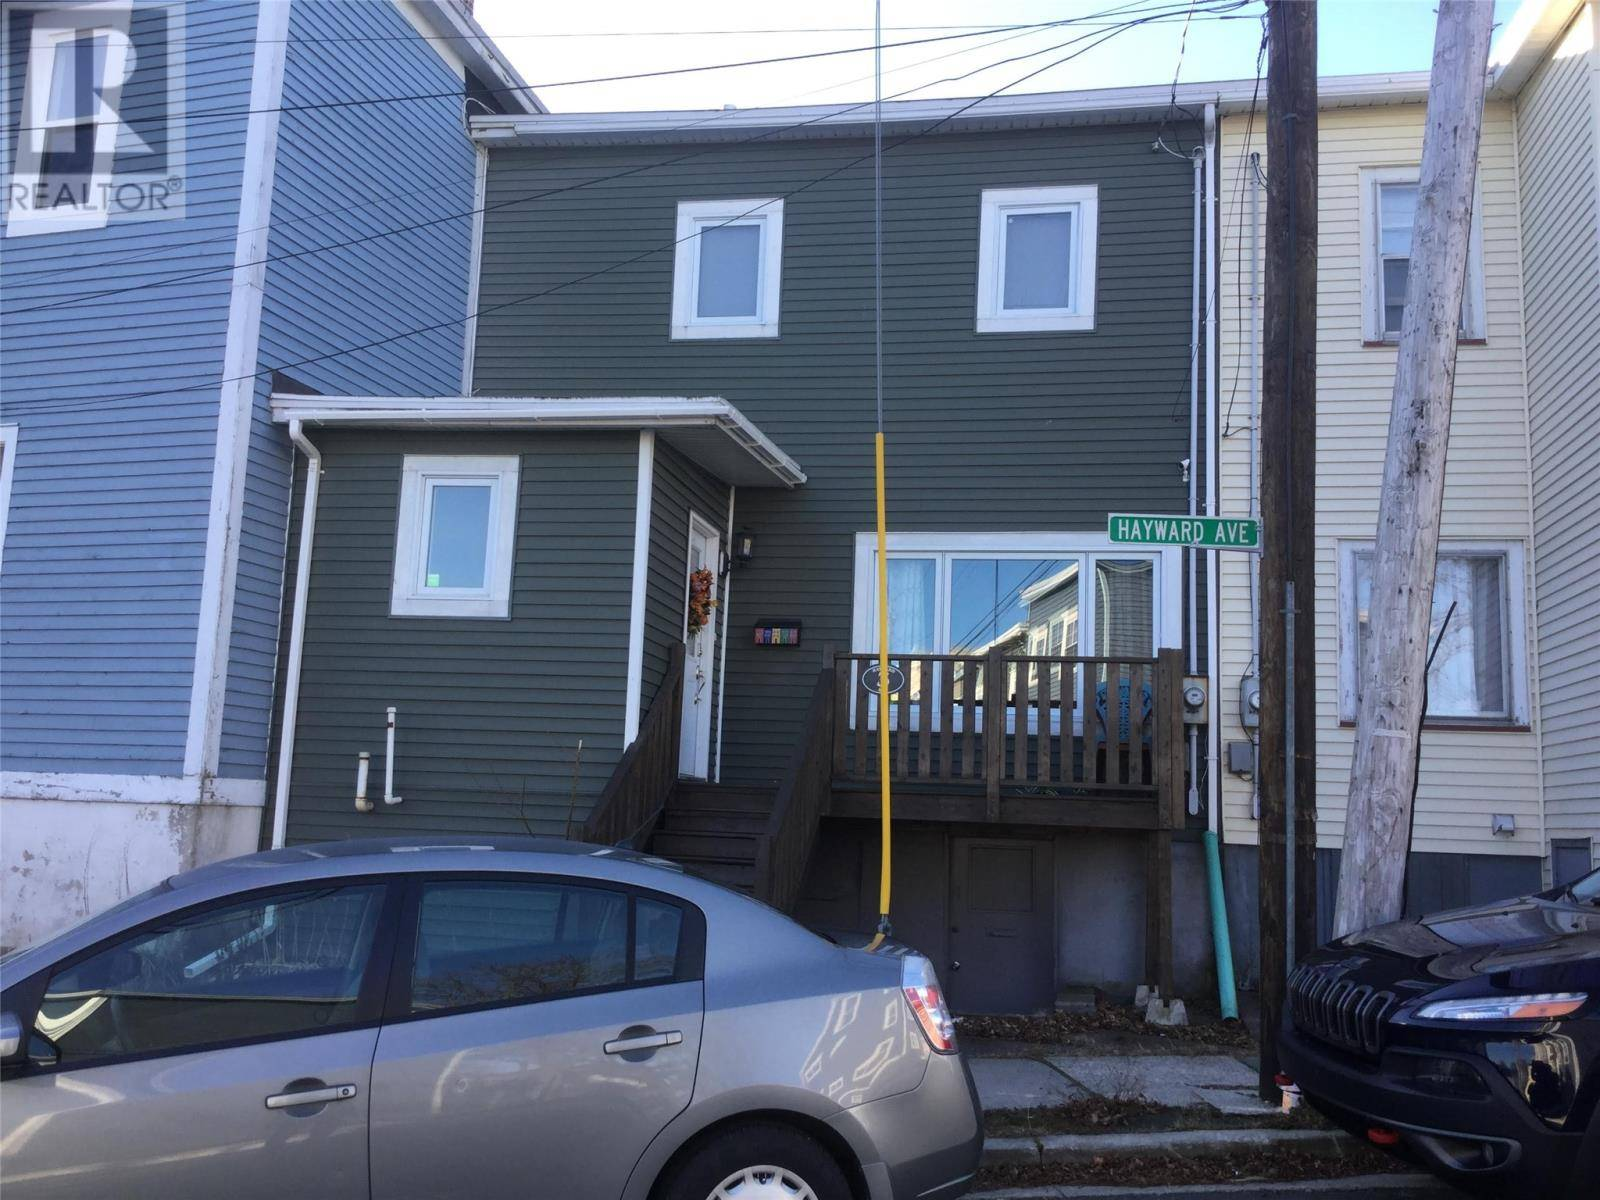 House for sale at 3 Hayward Ave St. John's Newfoundland - MLS: 1211182